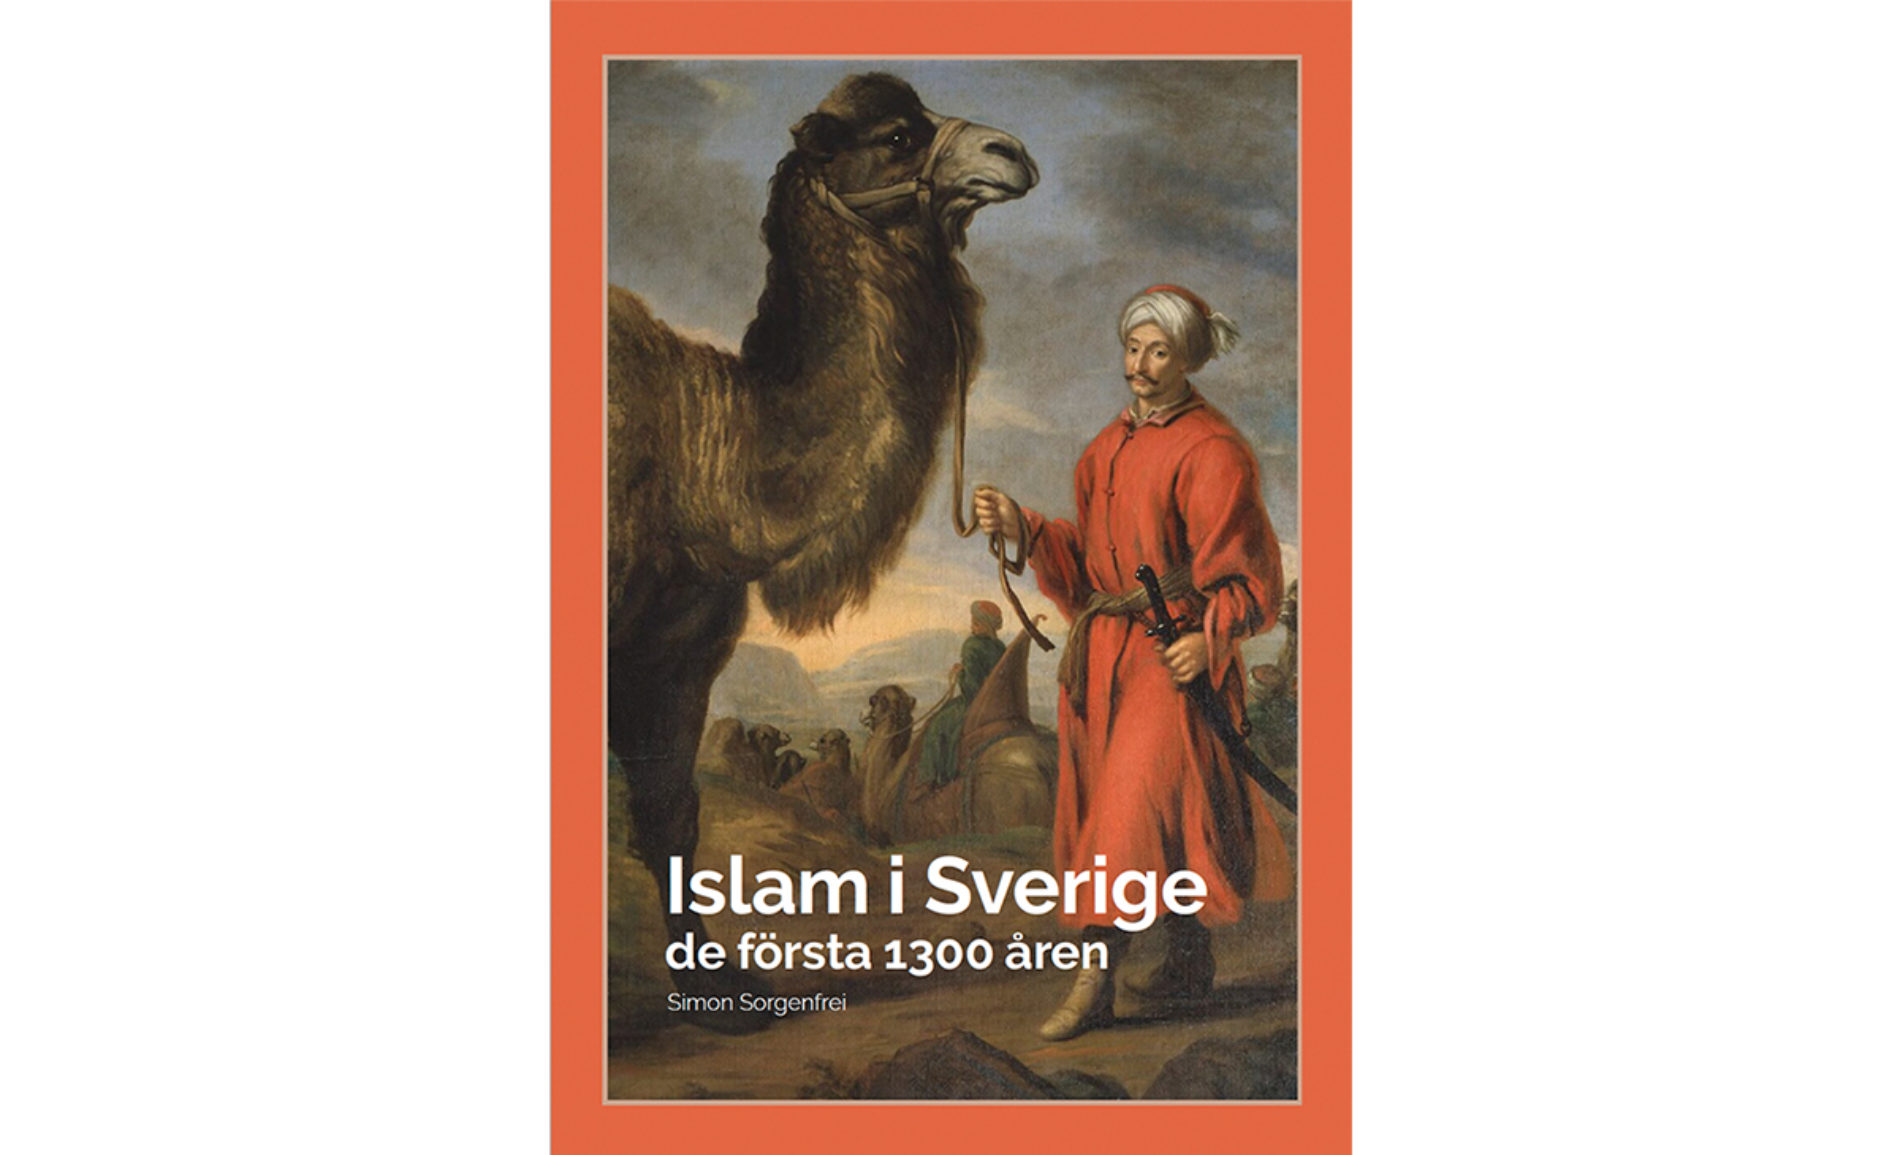 Islams historia i Sverige kartlagd